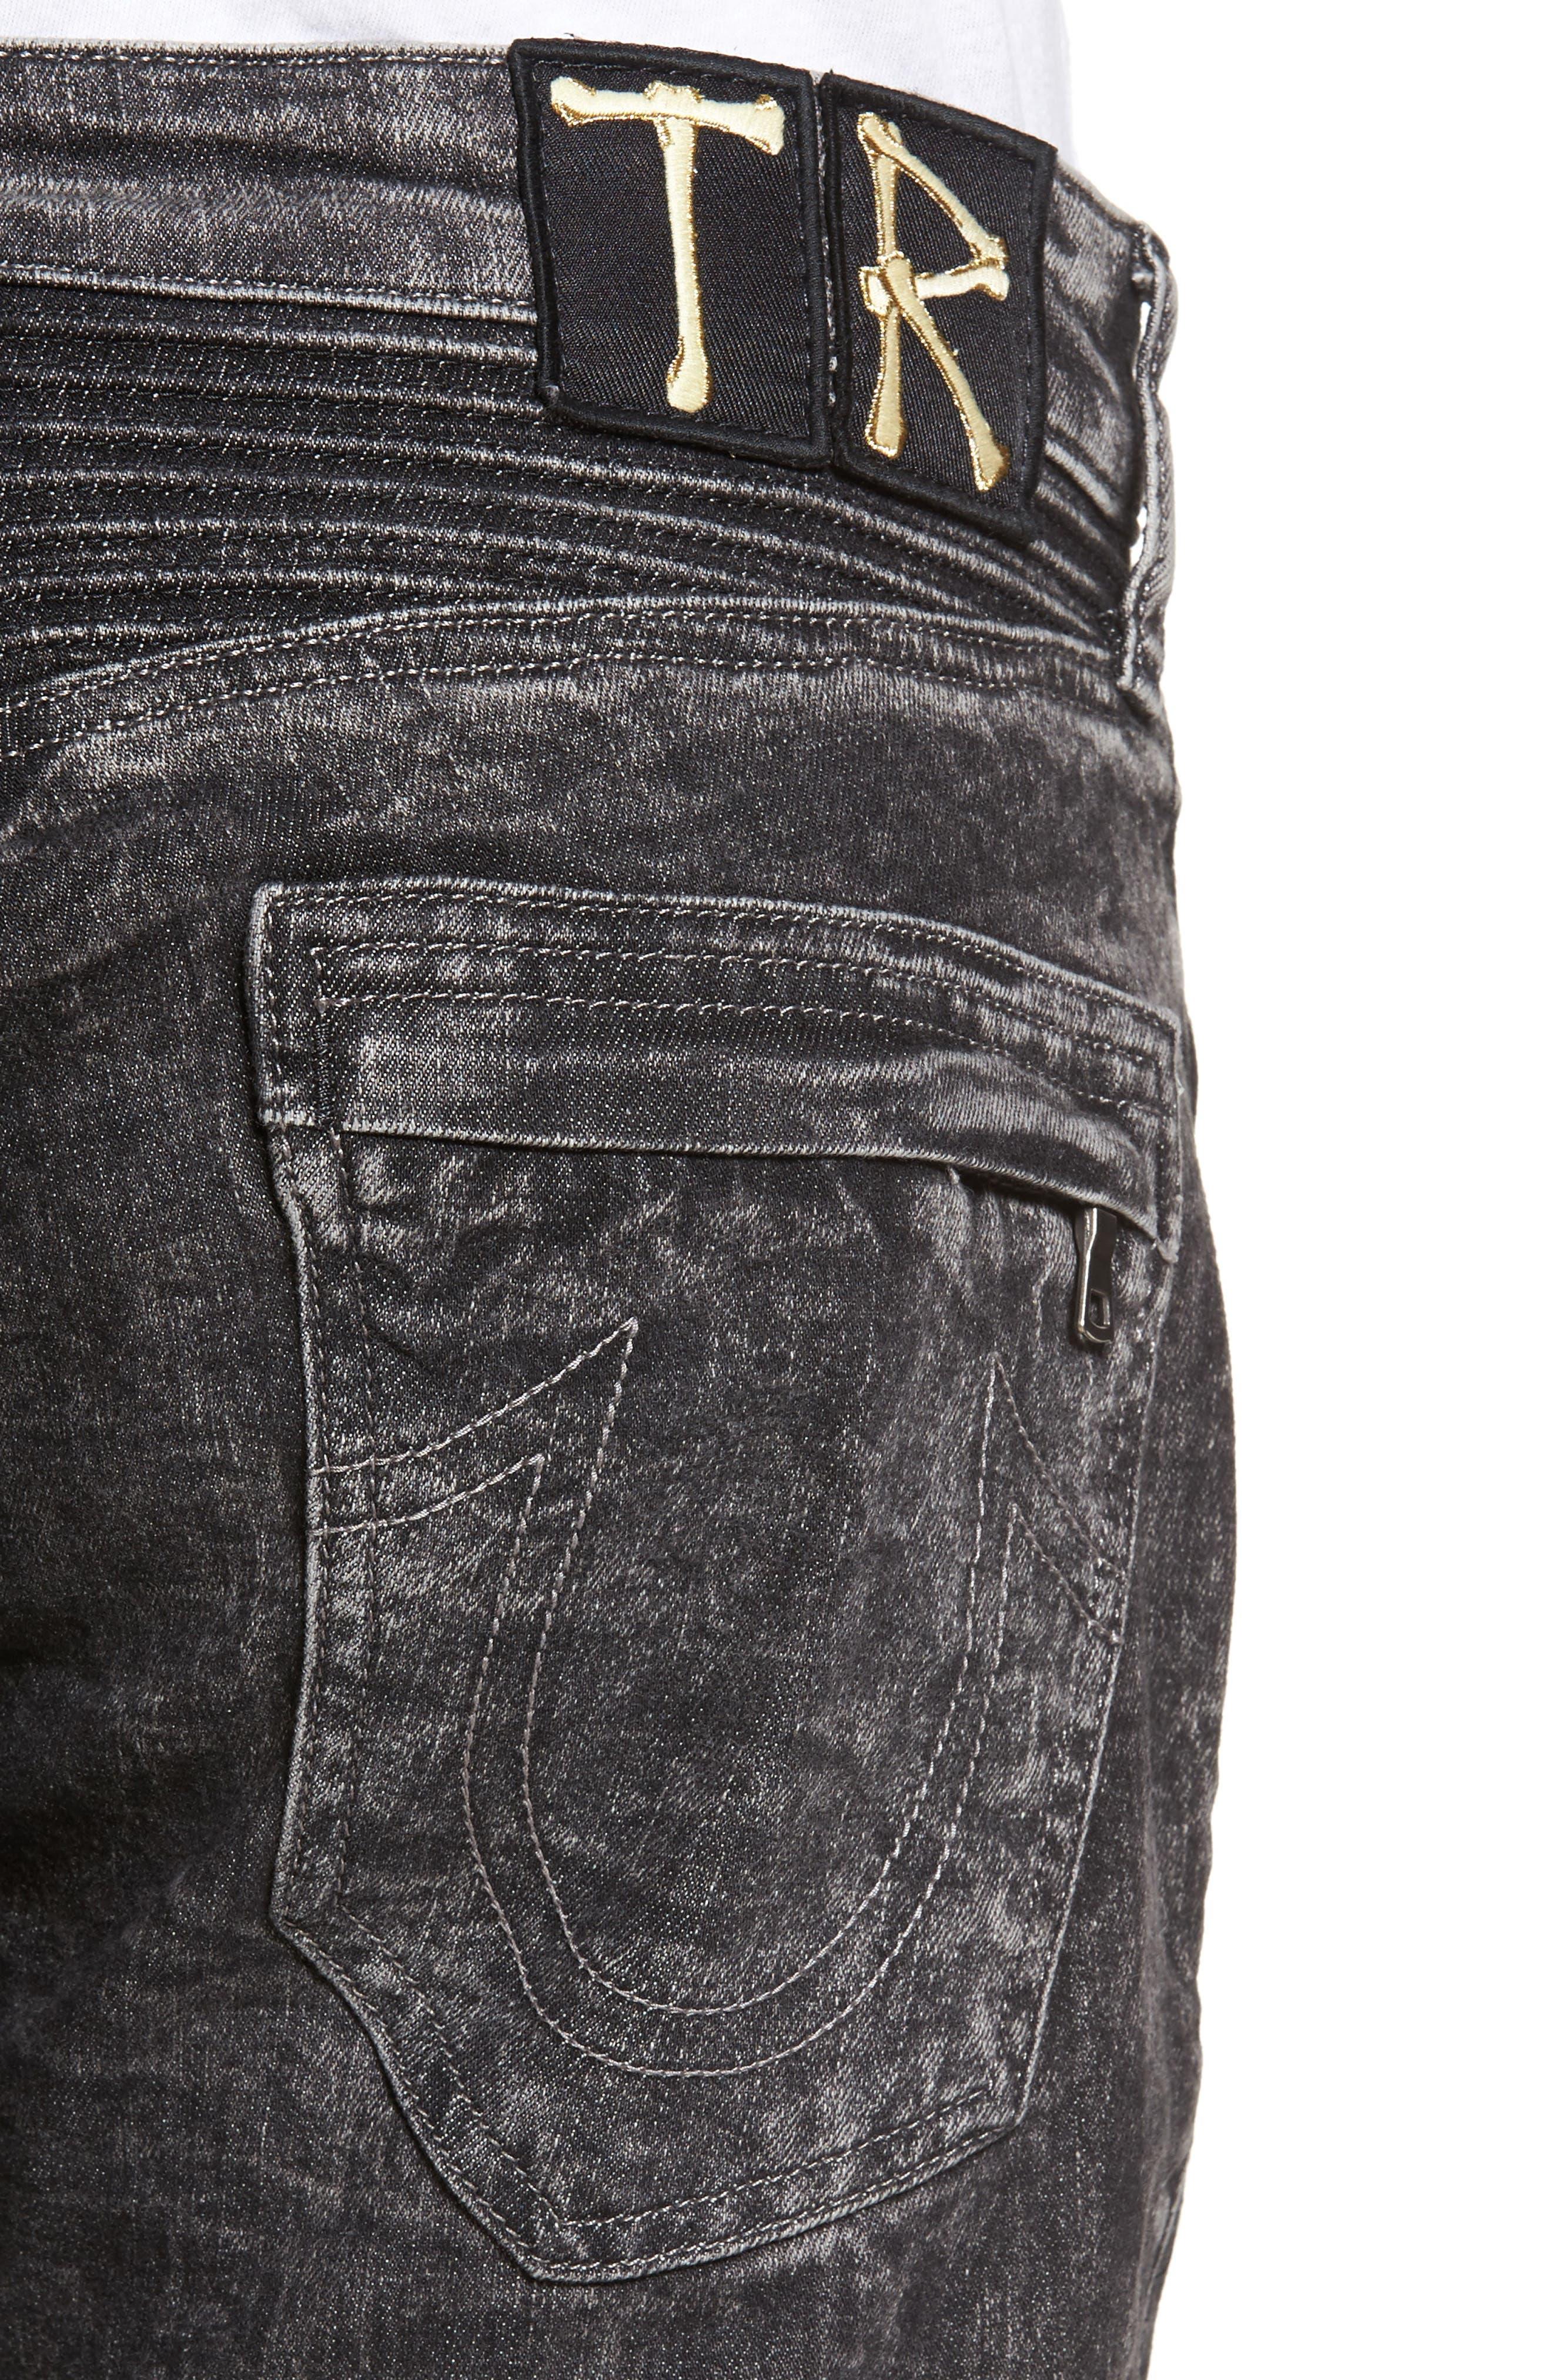 Rocco Skinny Fit Jeans,                             Alternate thumbnail 4, color,                             Dark Raven